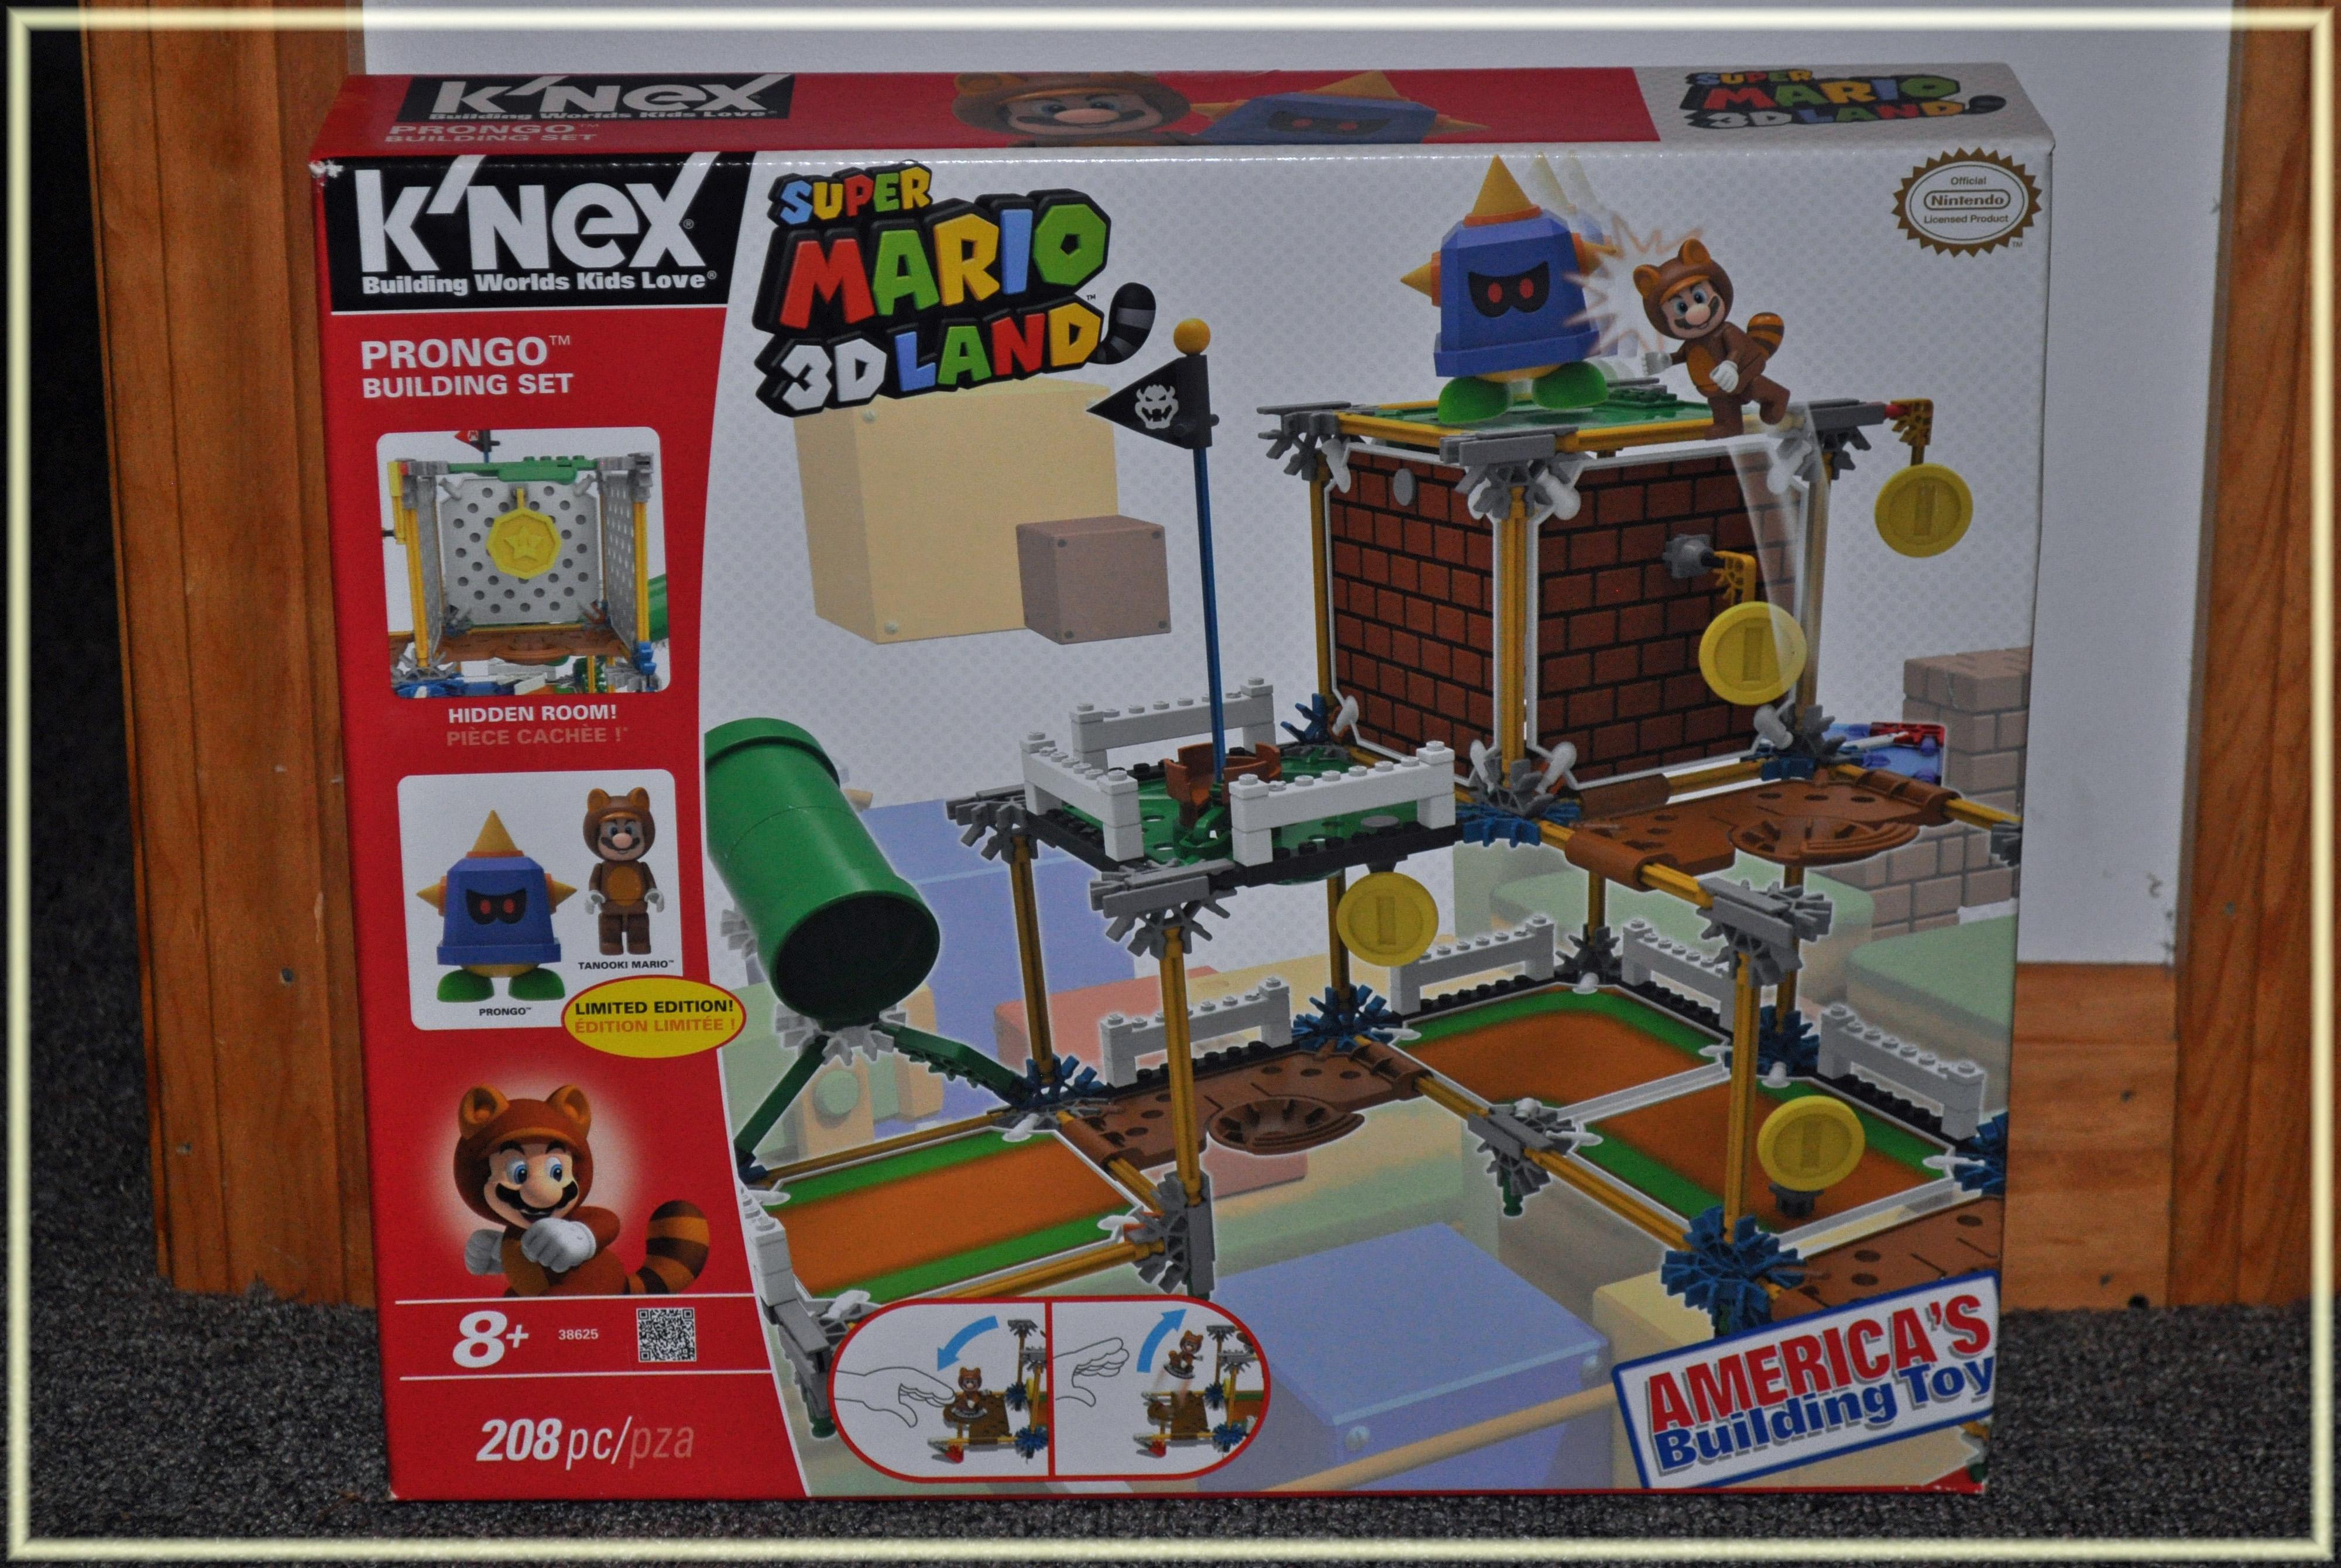 K'NEX Nintendo Super Mario 3D Land Prongo Building Set #Giveaway